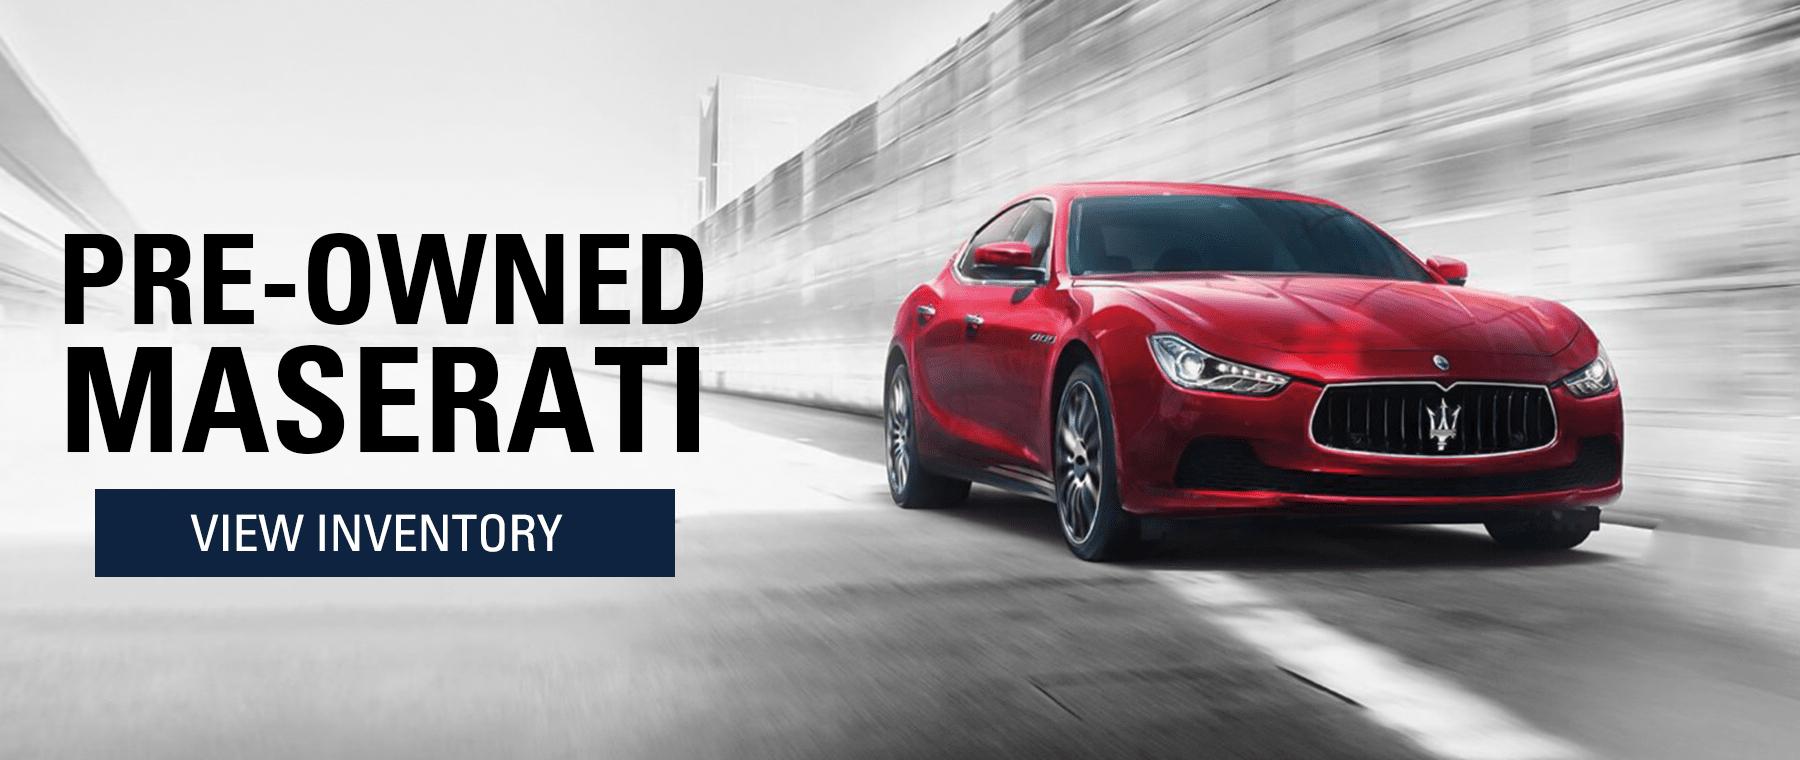 Used Maserati for sale